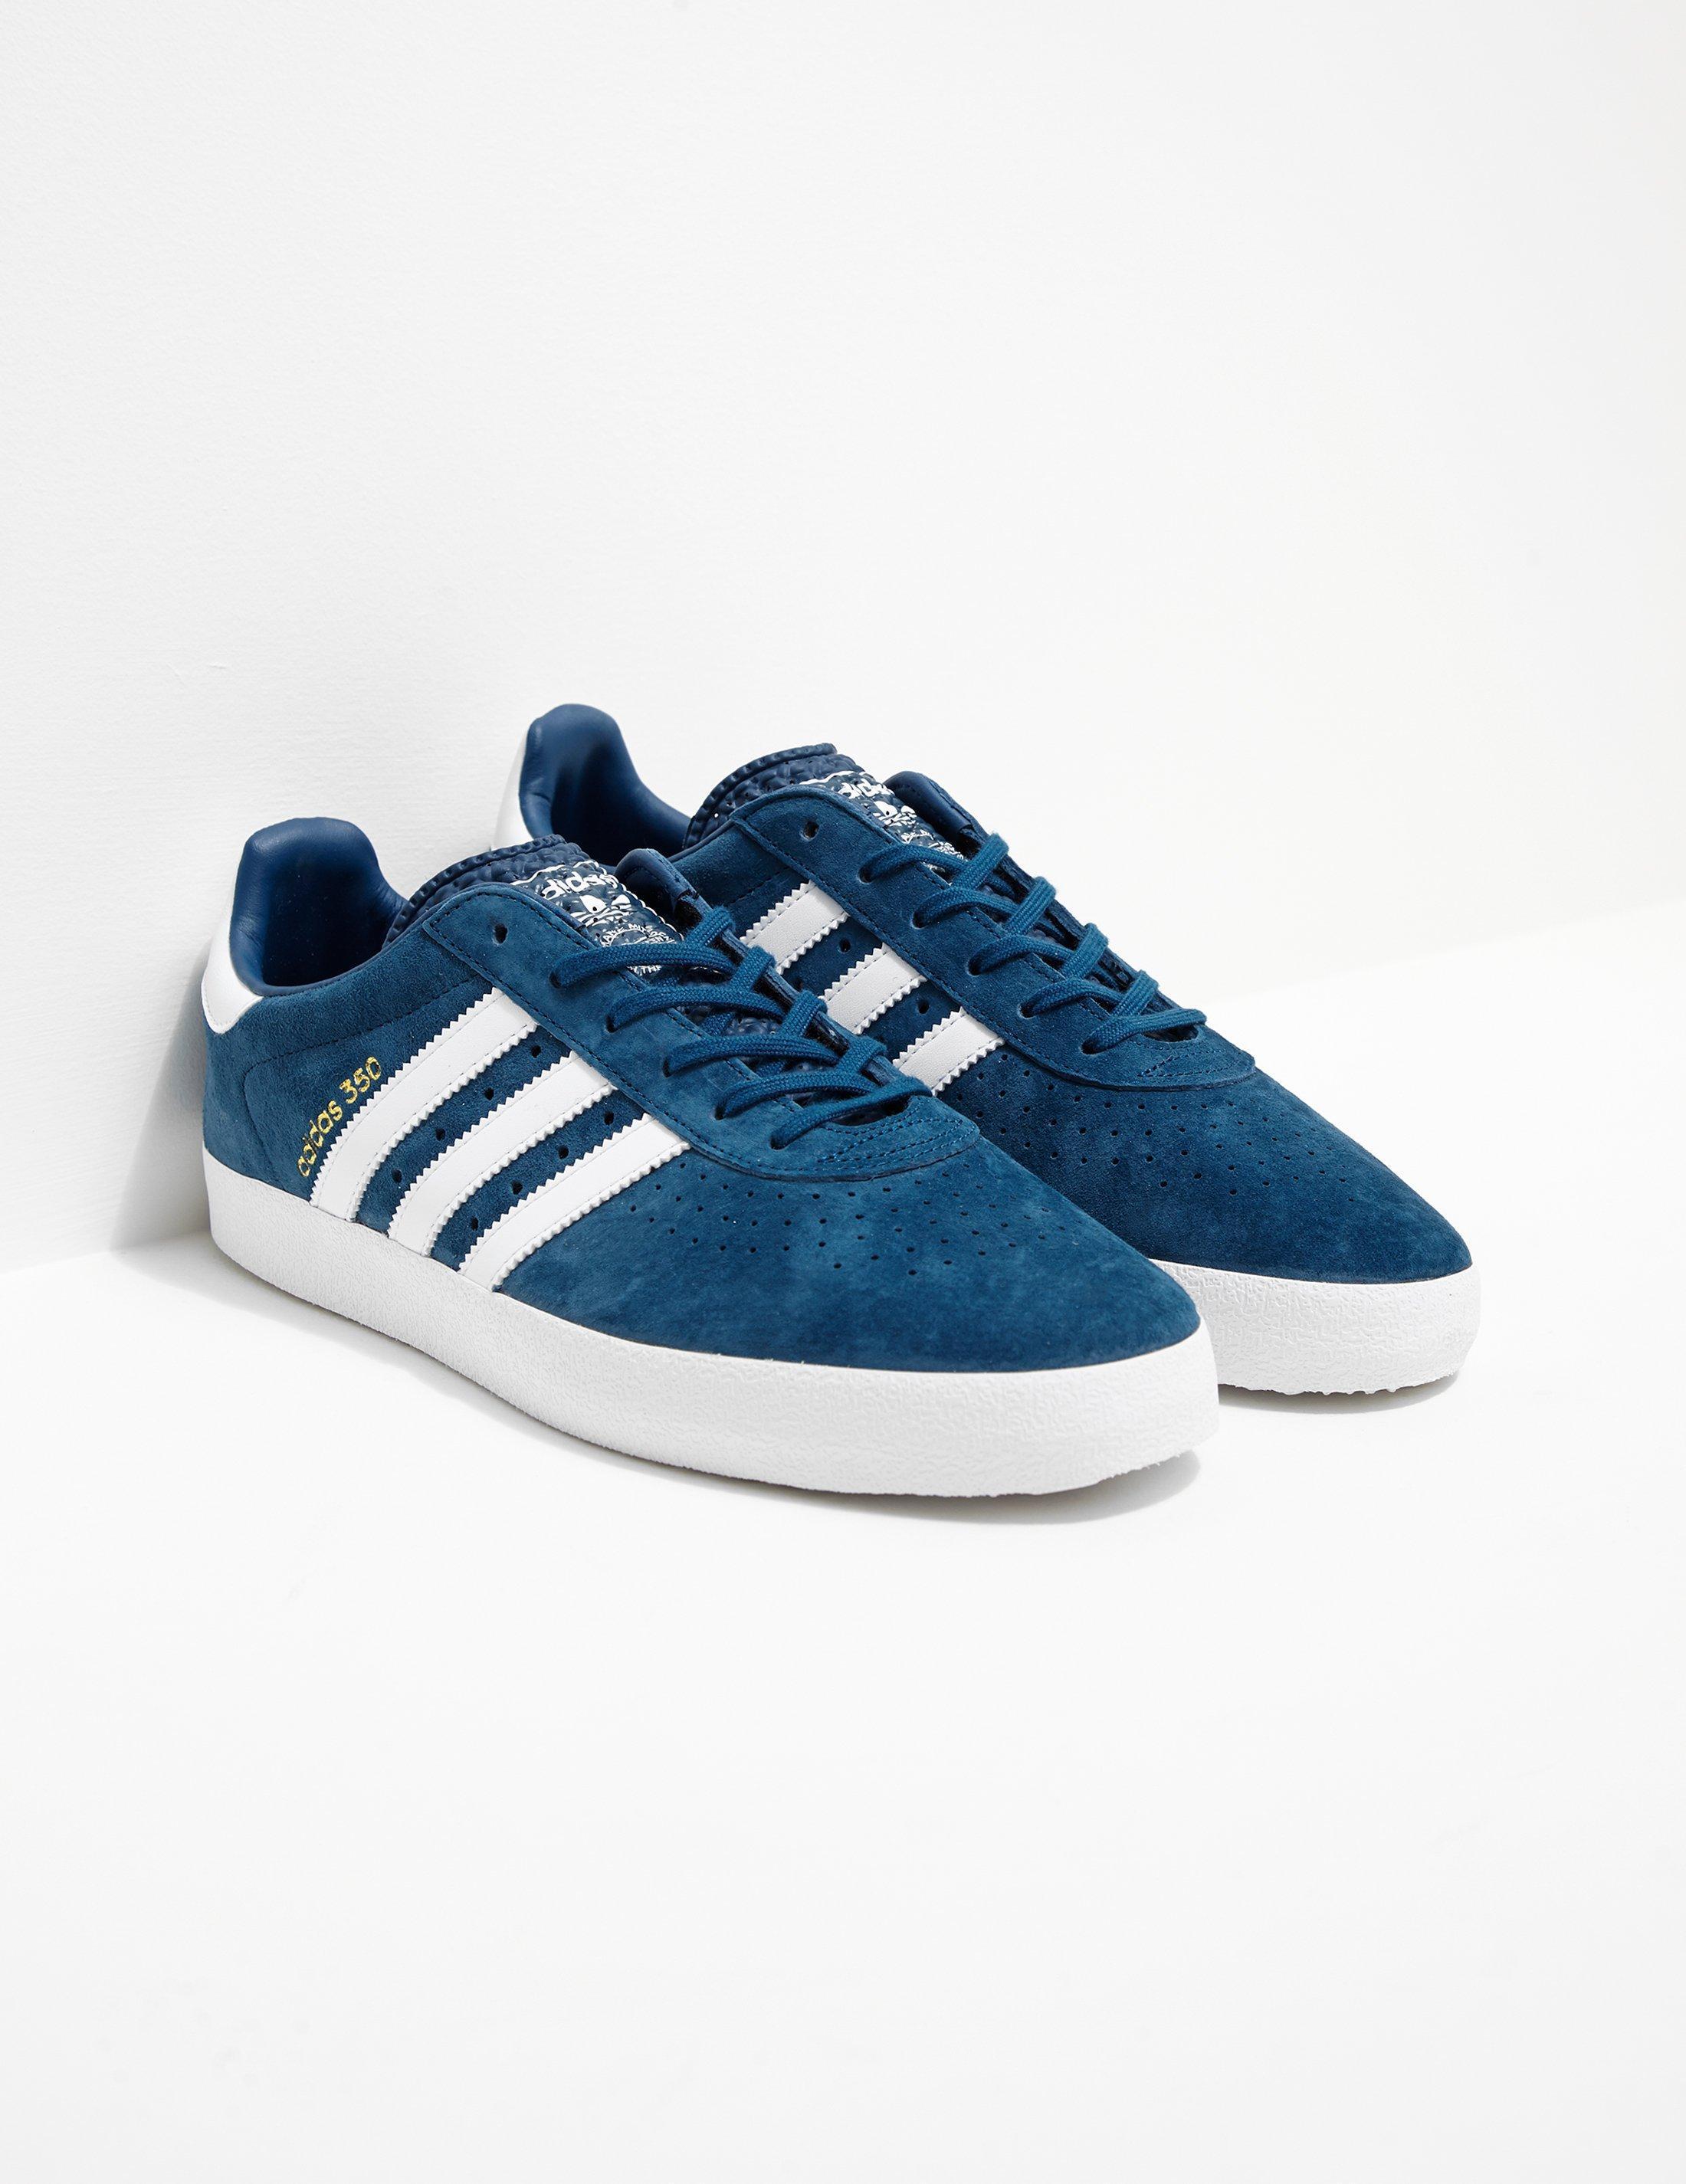 9f5a4b4fadc1 adidas Originals Mens 350 Suede Blue in Blue for Men - Lyst